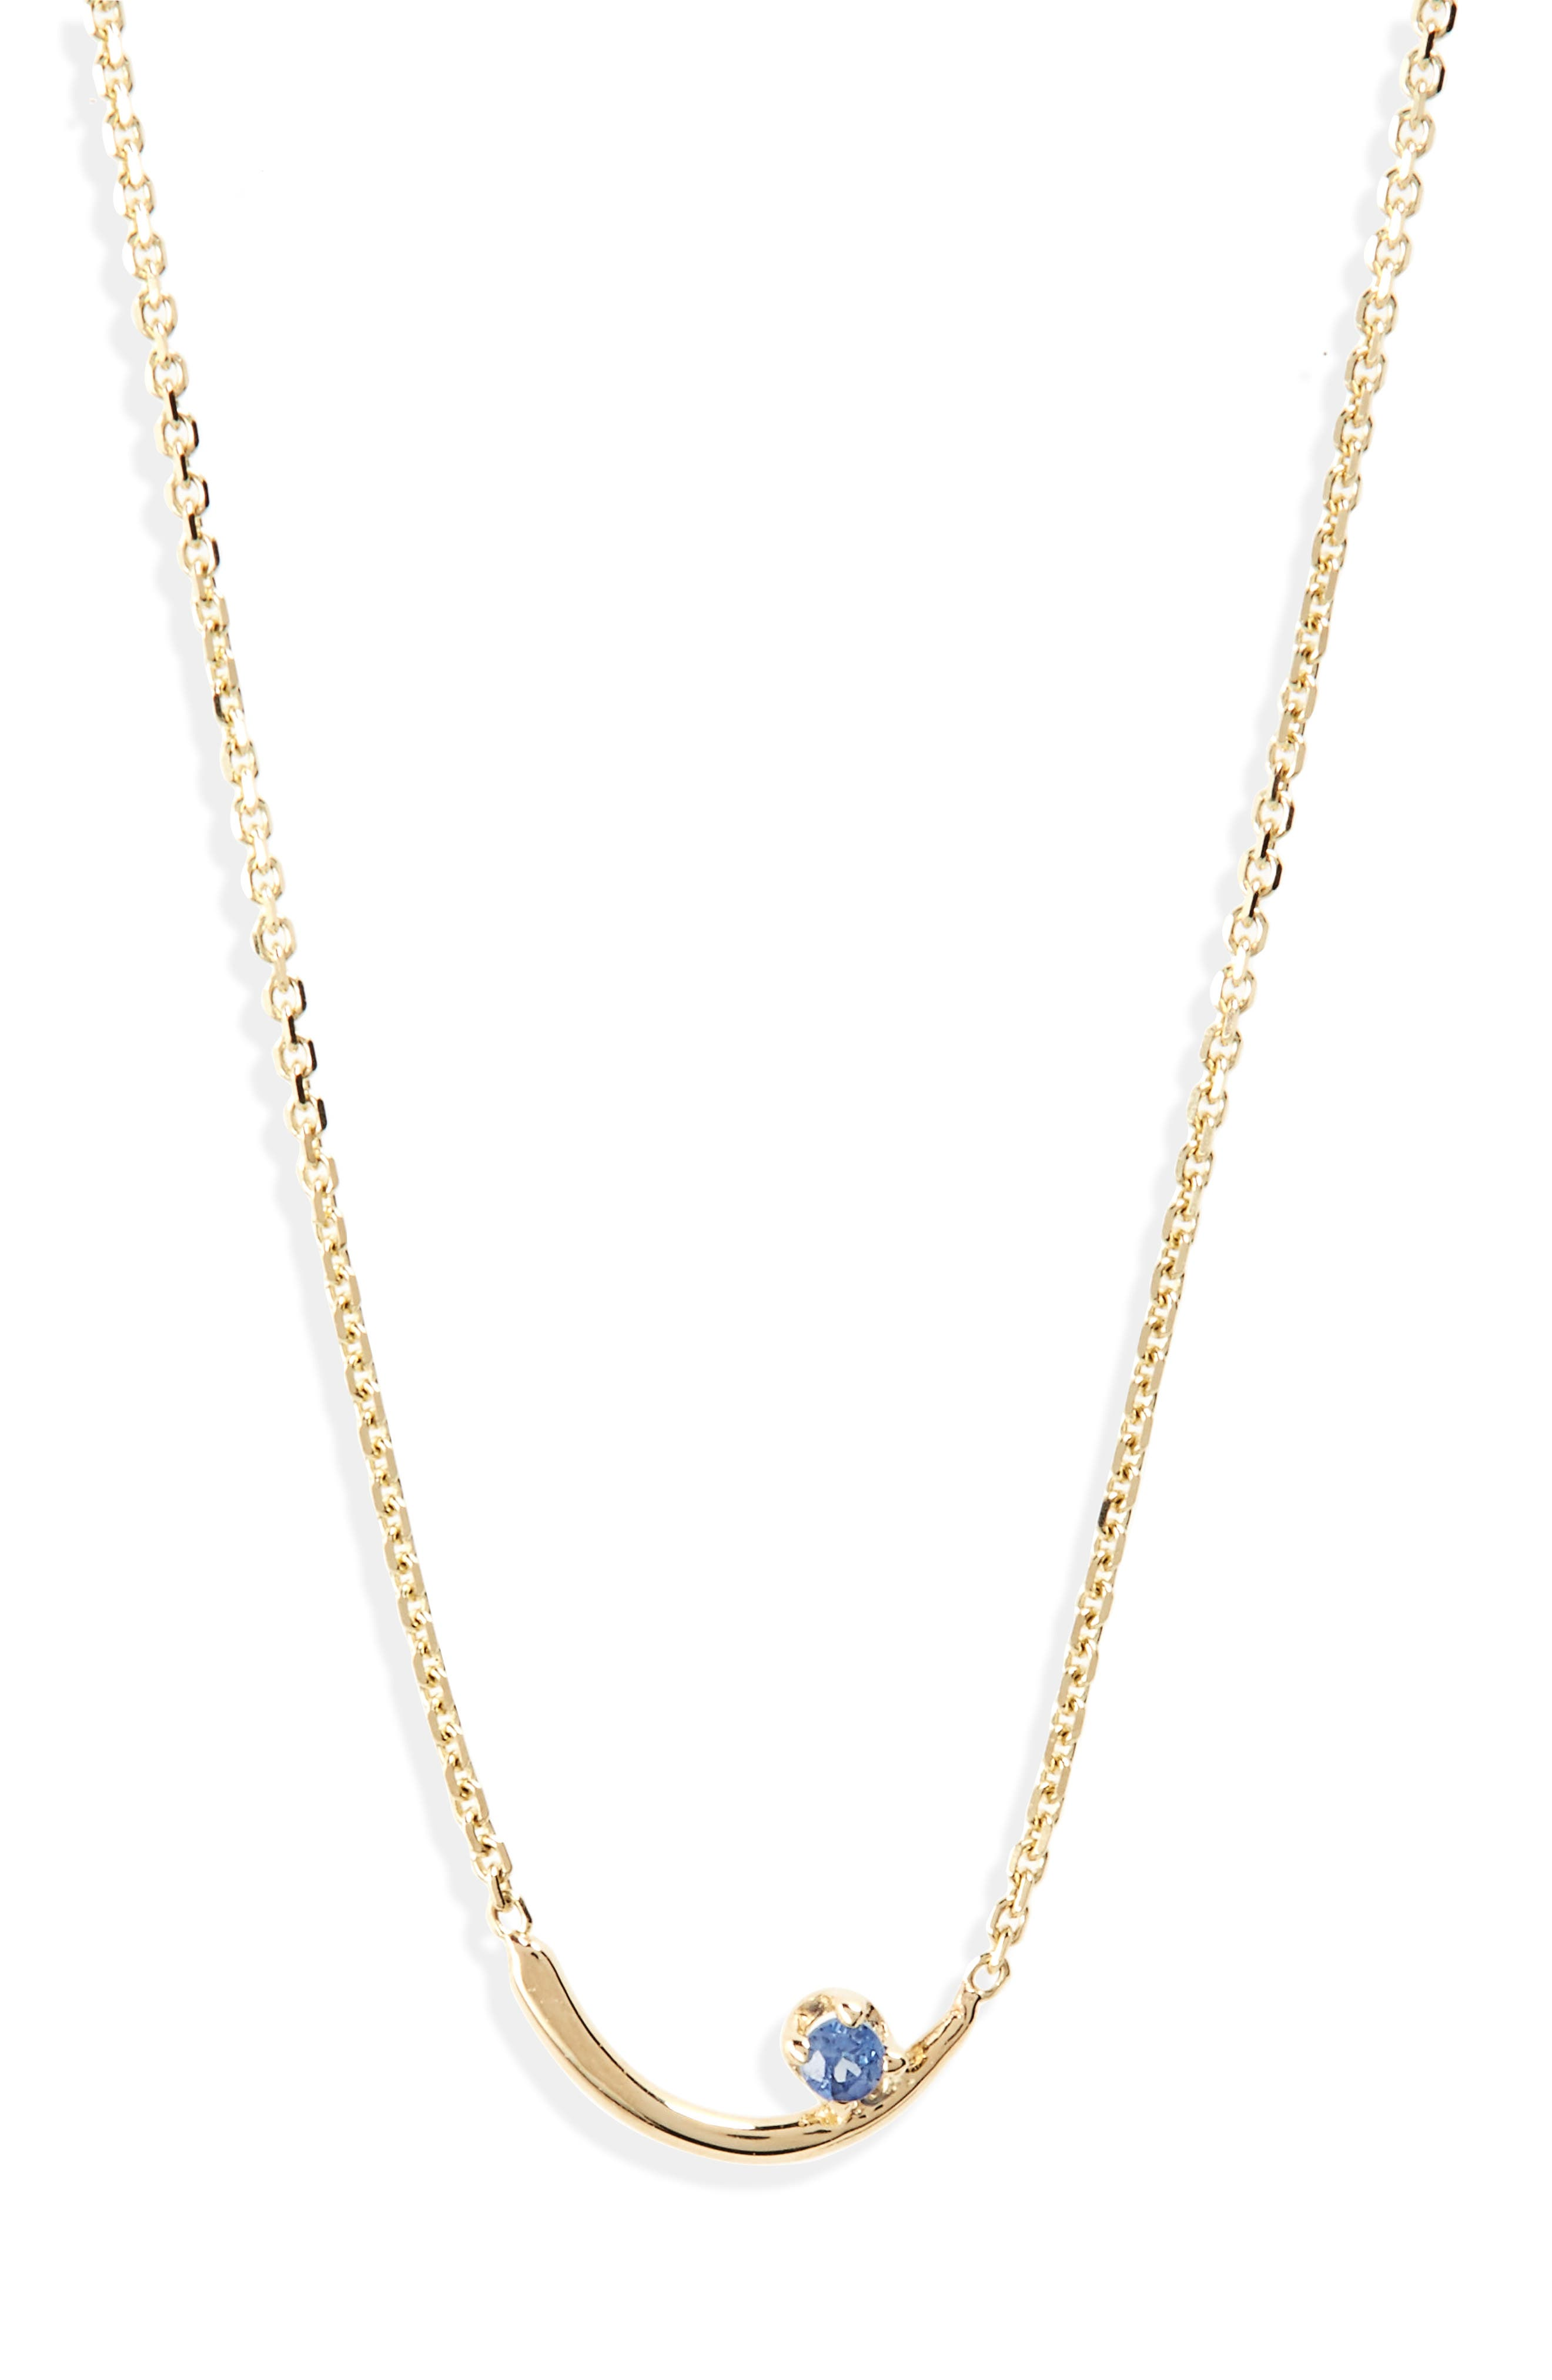 Main Image - WWAKE Arc Lineage Necklace